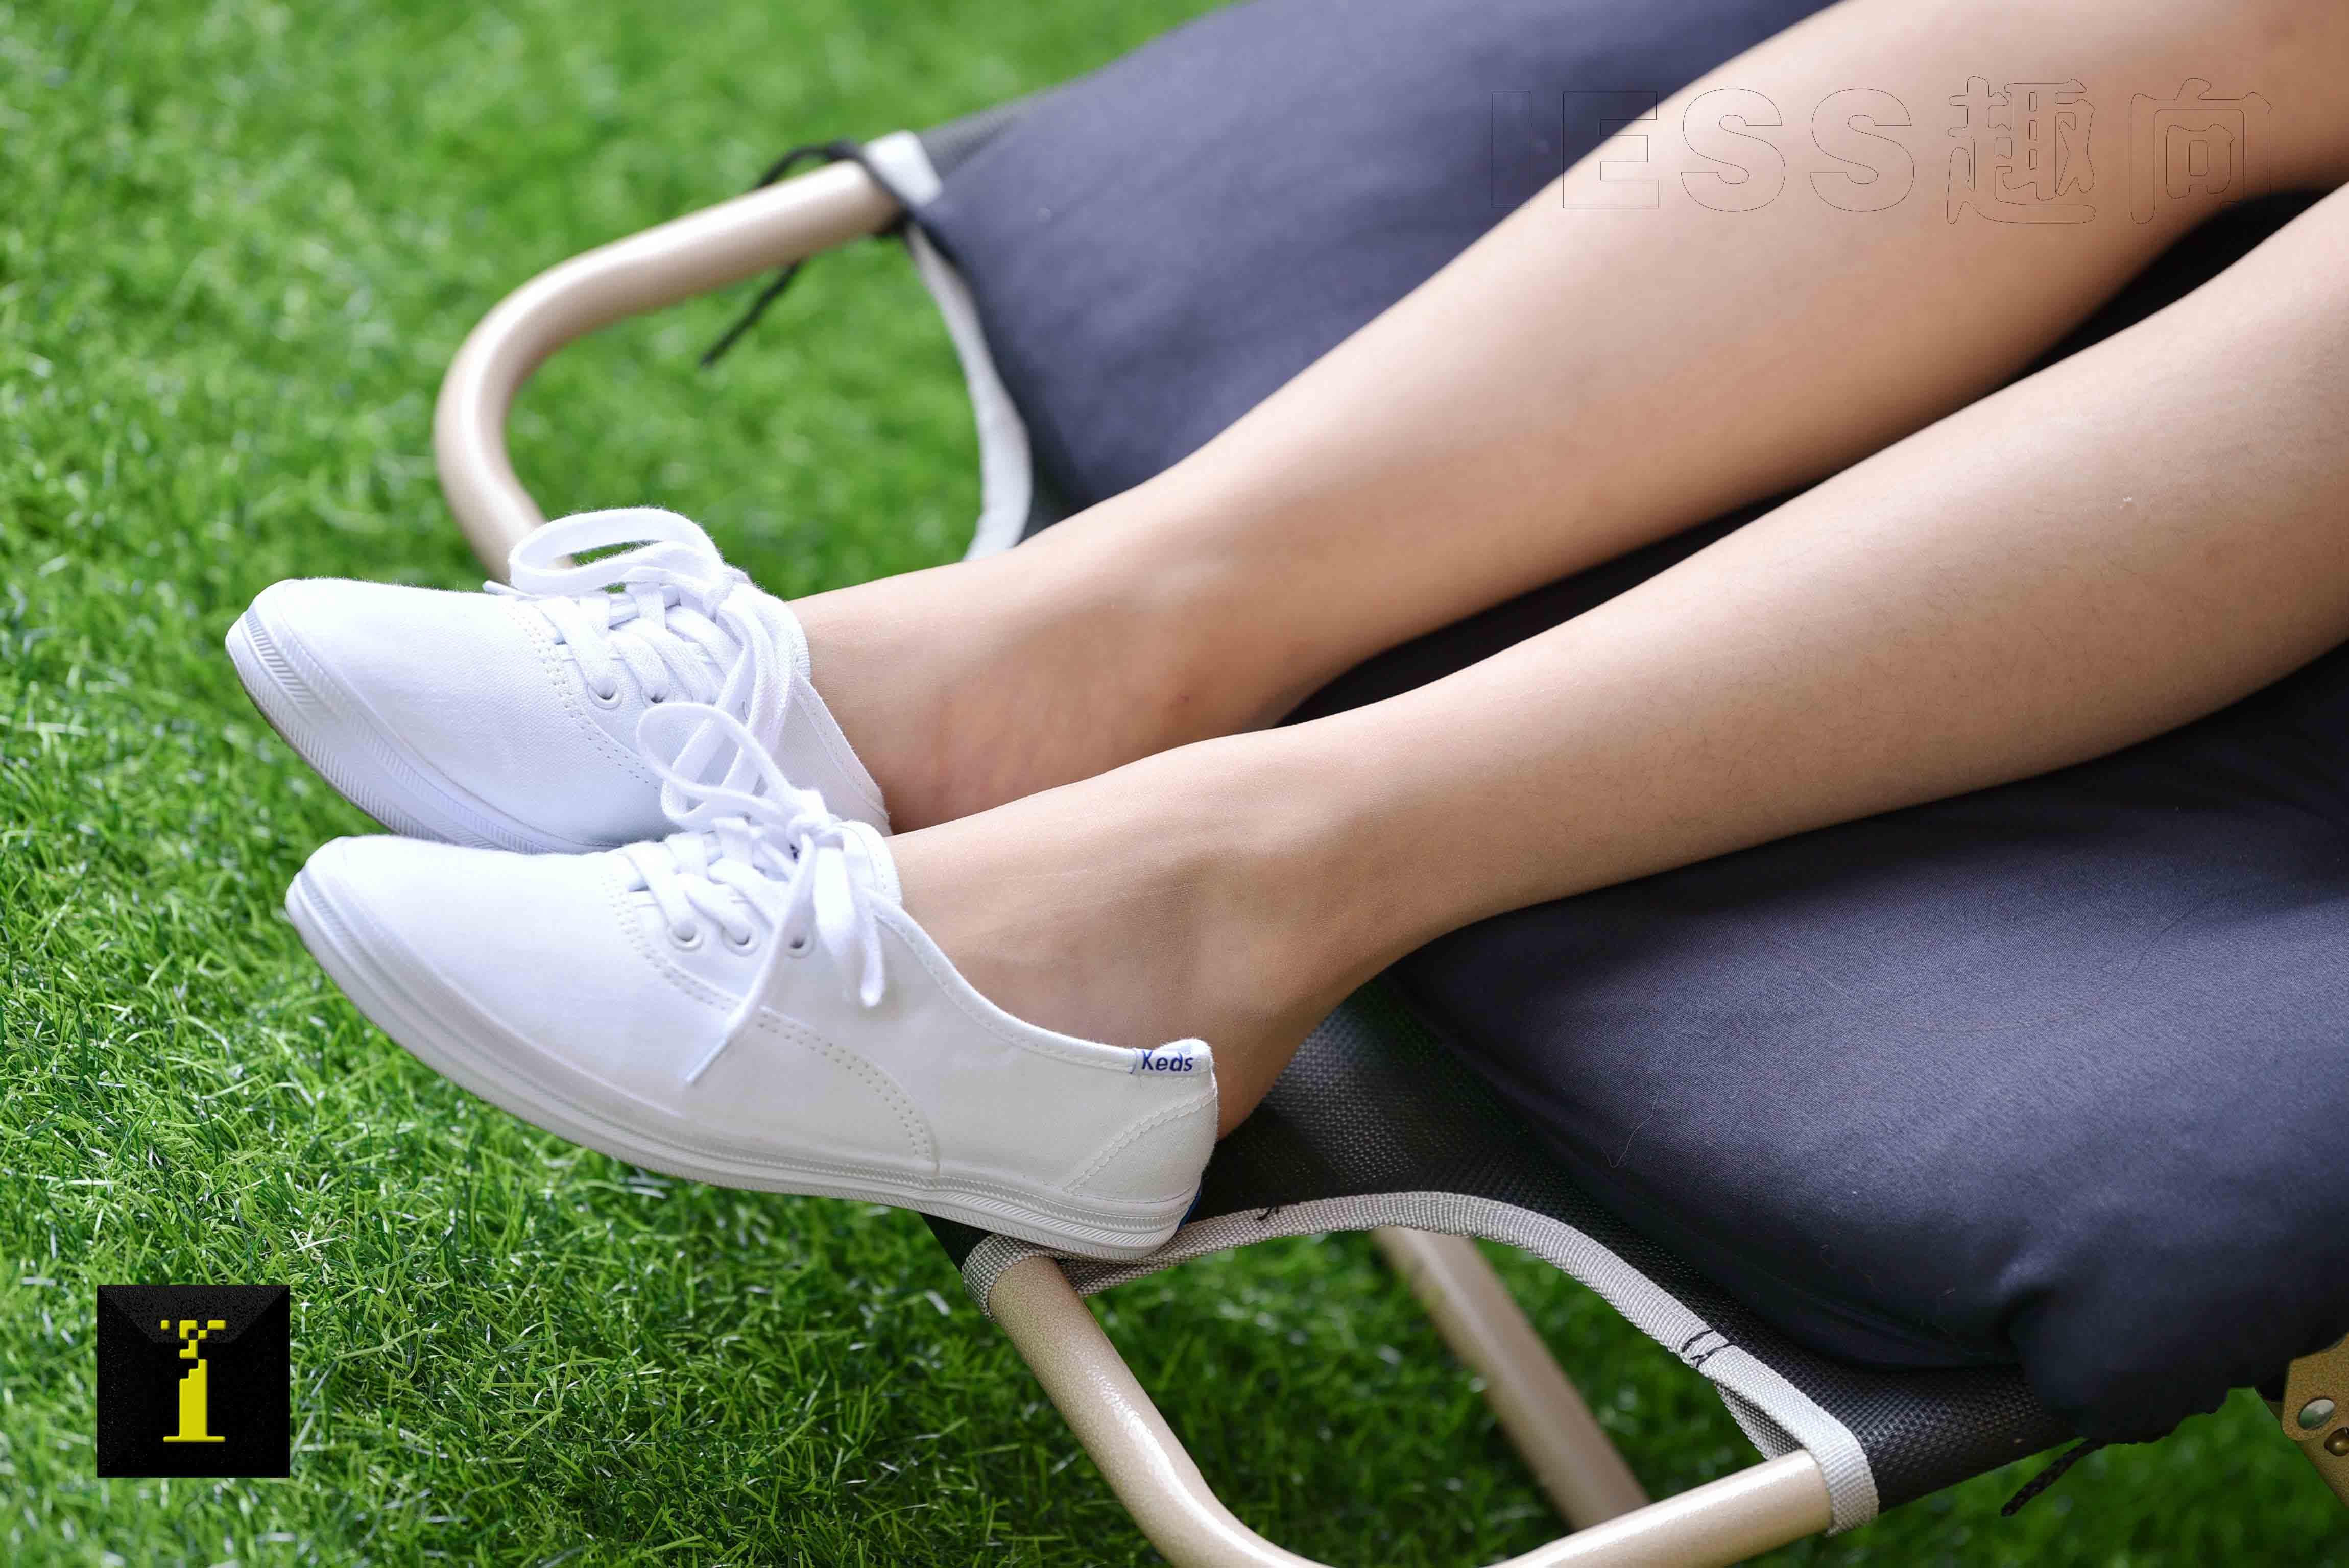 [IESS異思趣向] 普惠集 151-信子的JK和小白鞋 [75P109MB] - 奈雪の圖